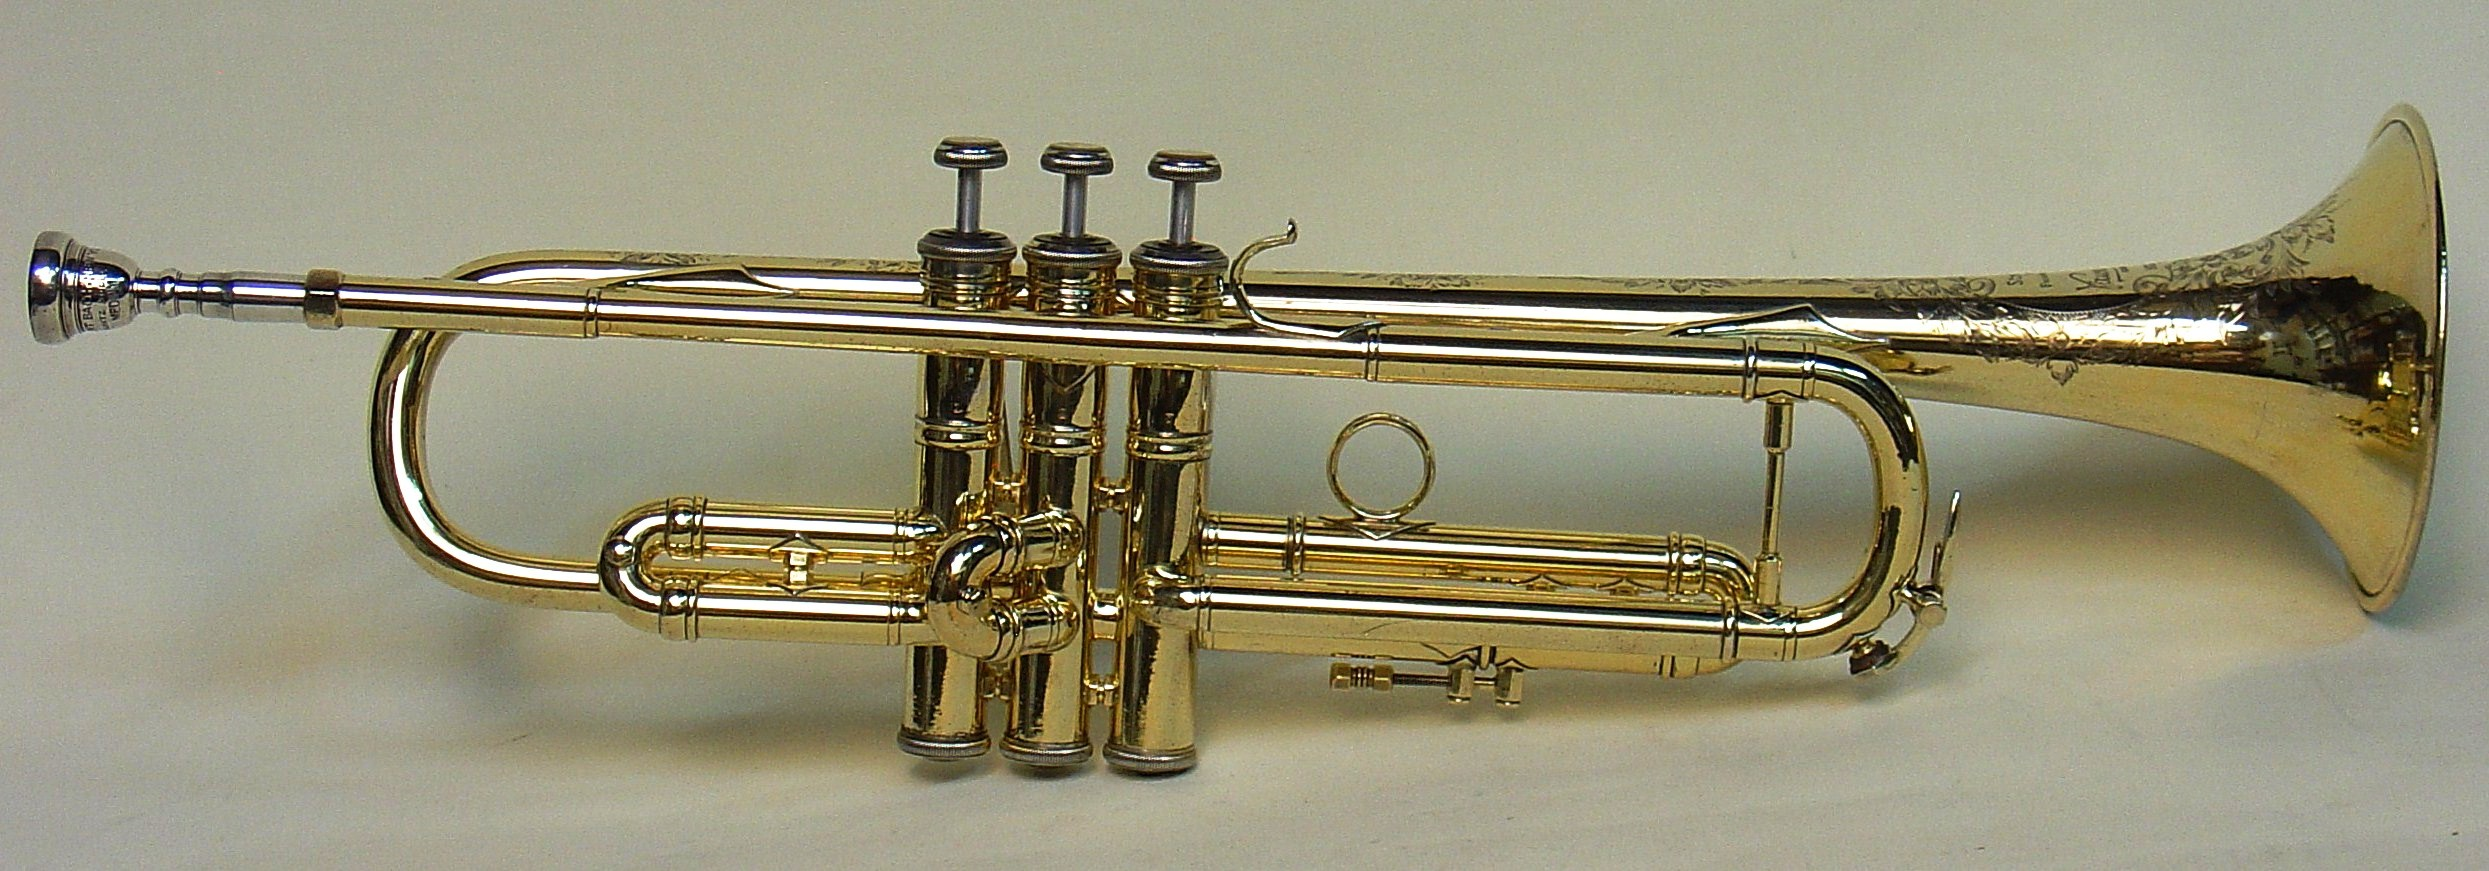 Bach959a.JPG